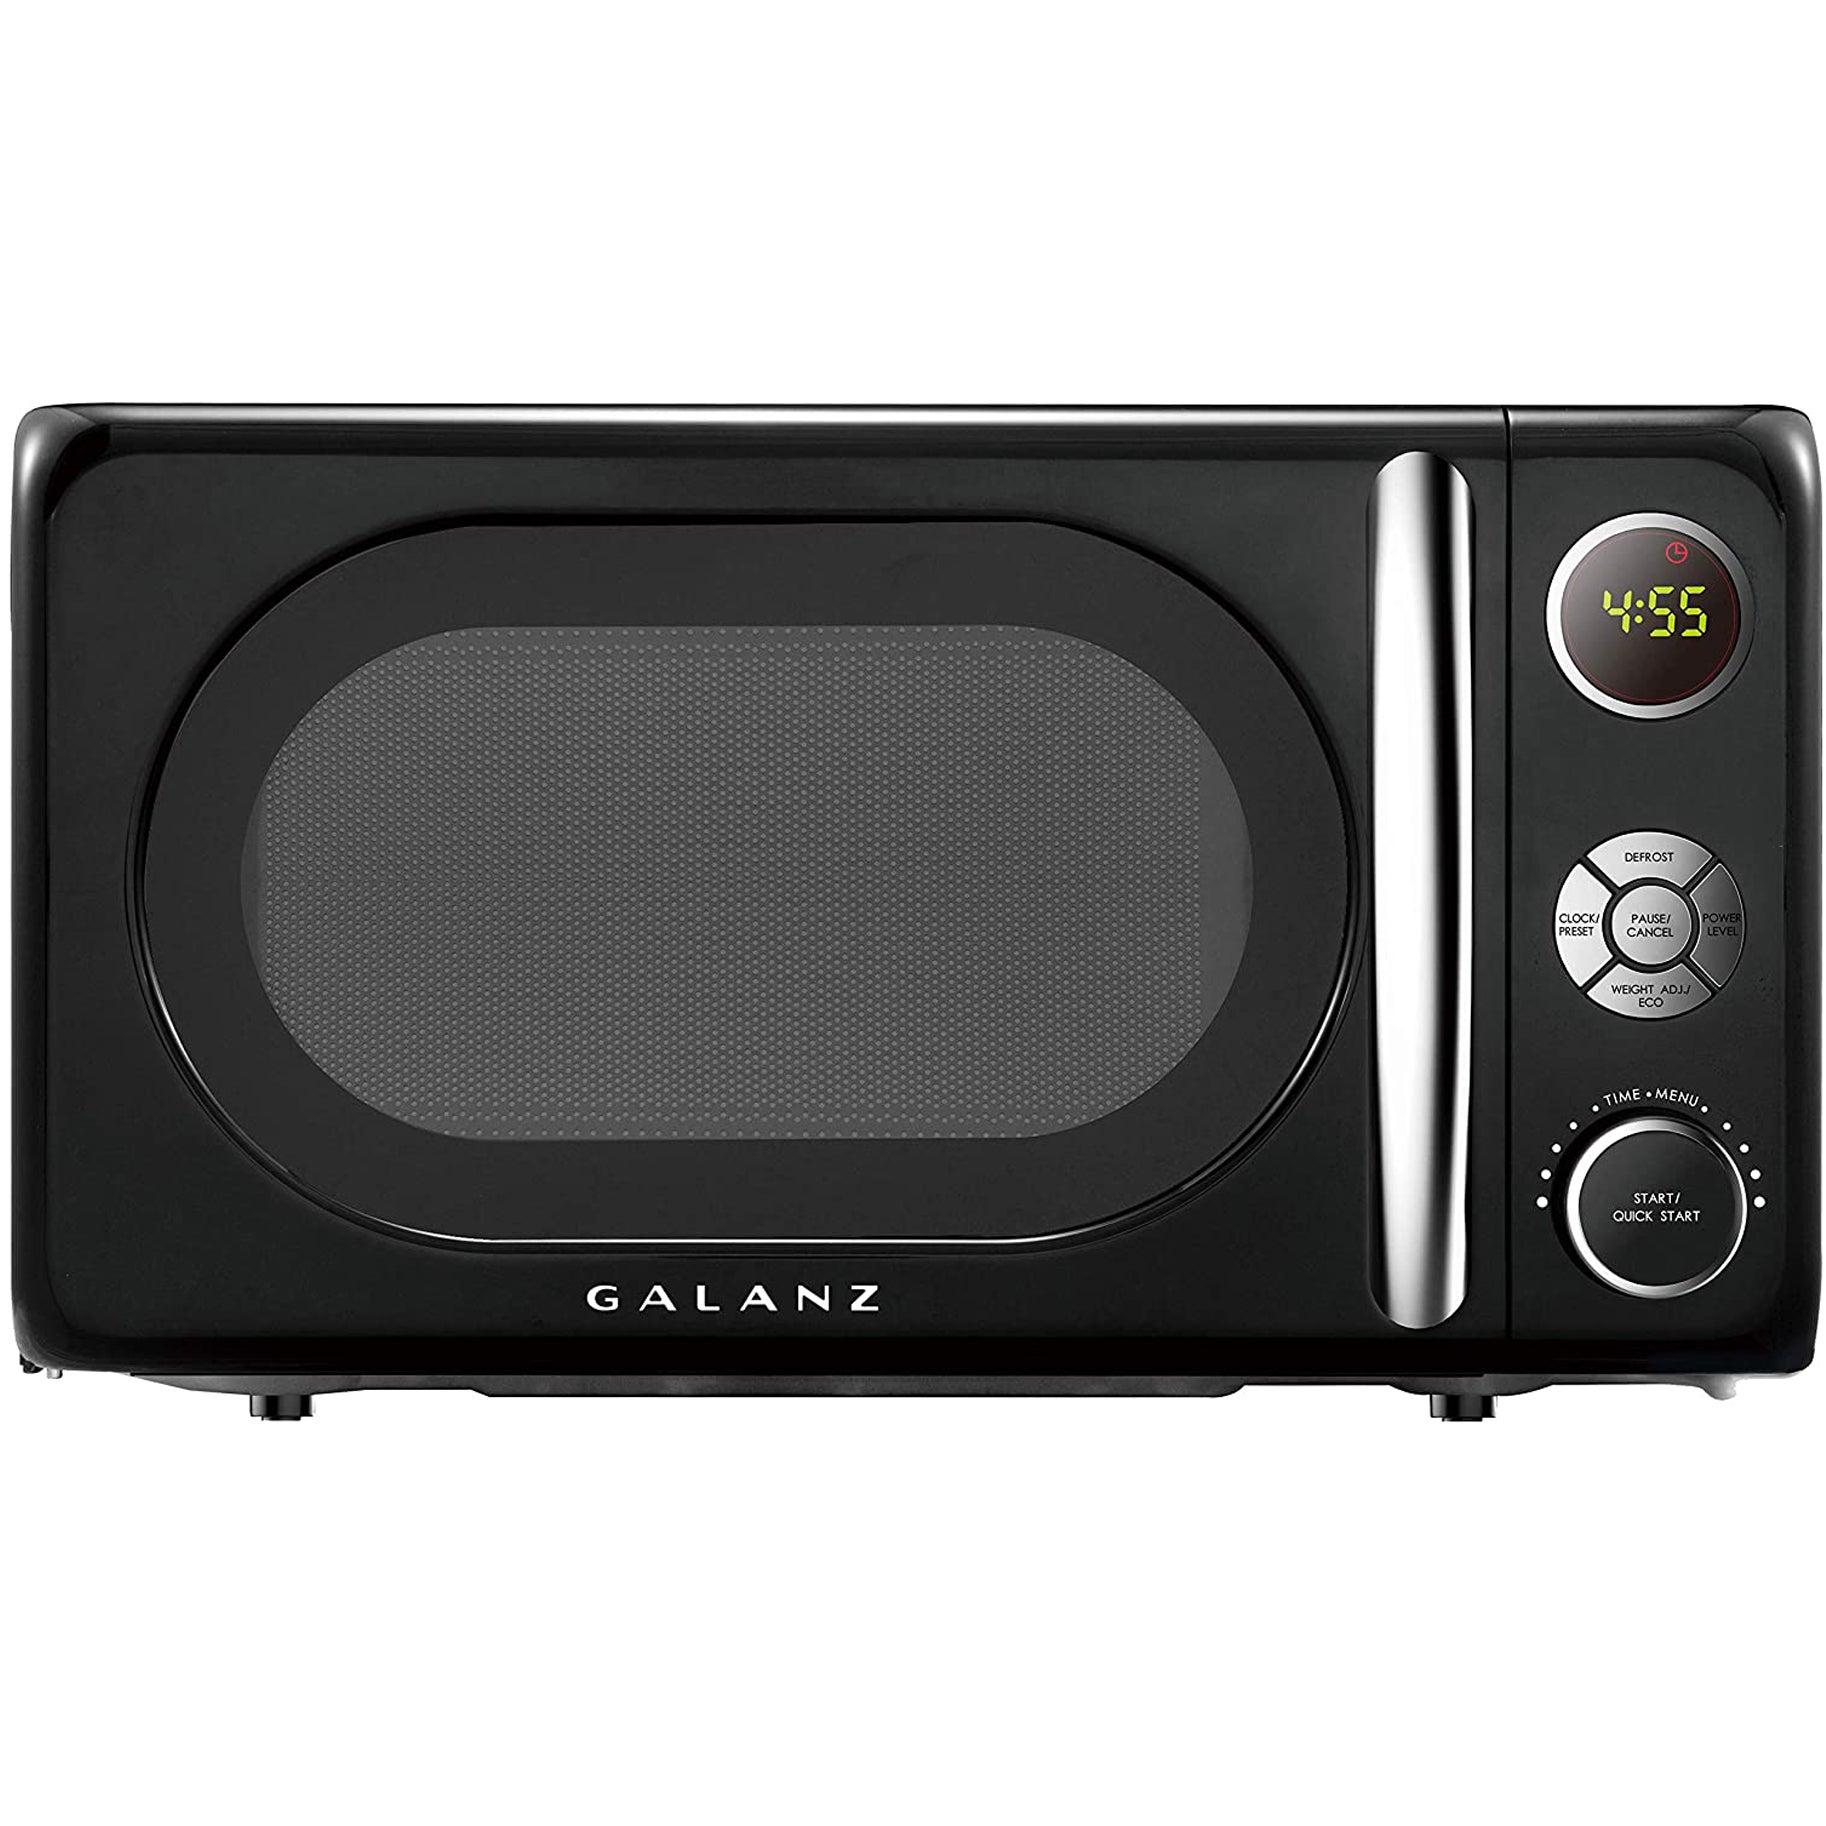 The Best Countertop Microwaves Option: Galanz GLCMKA07BKR-07